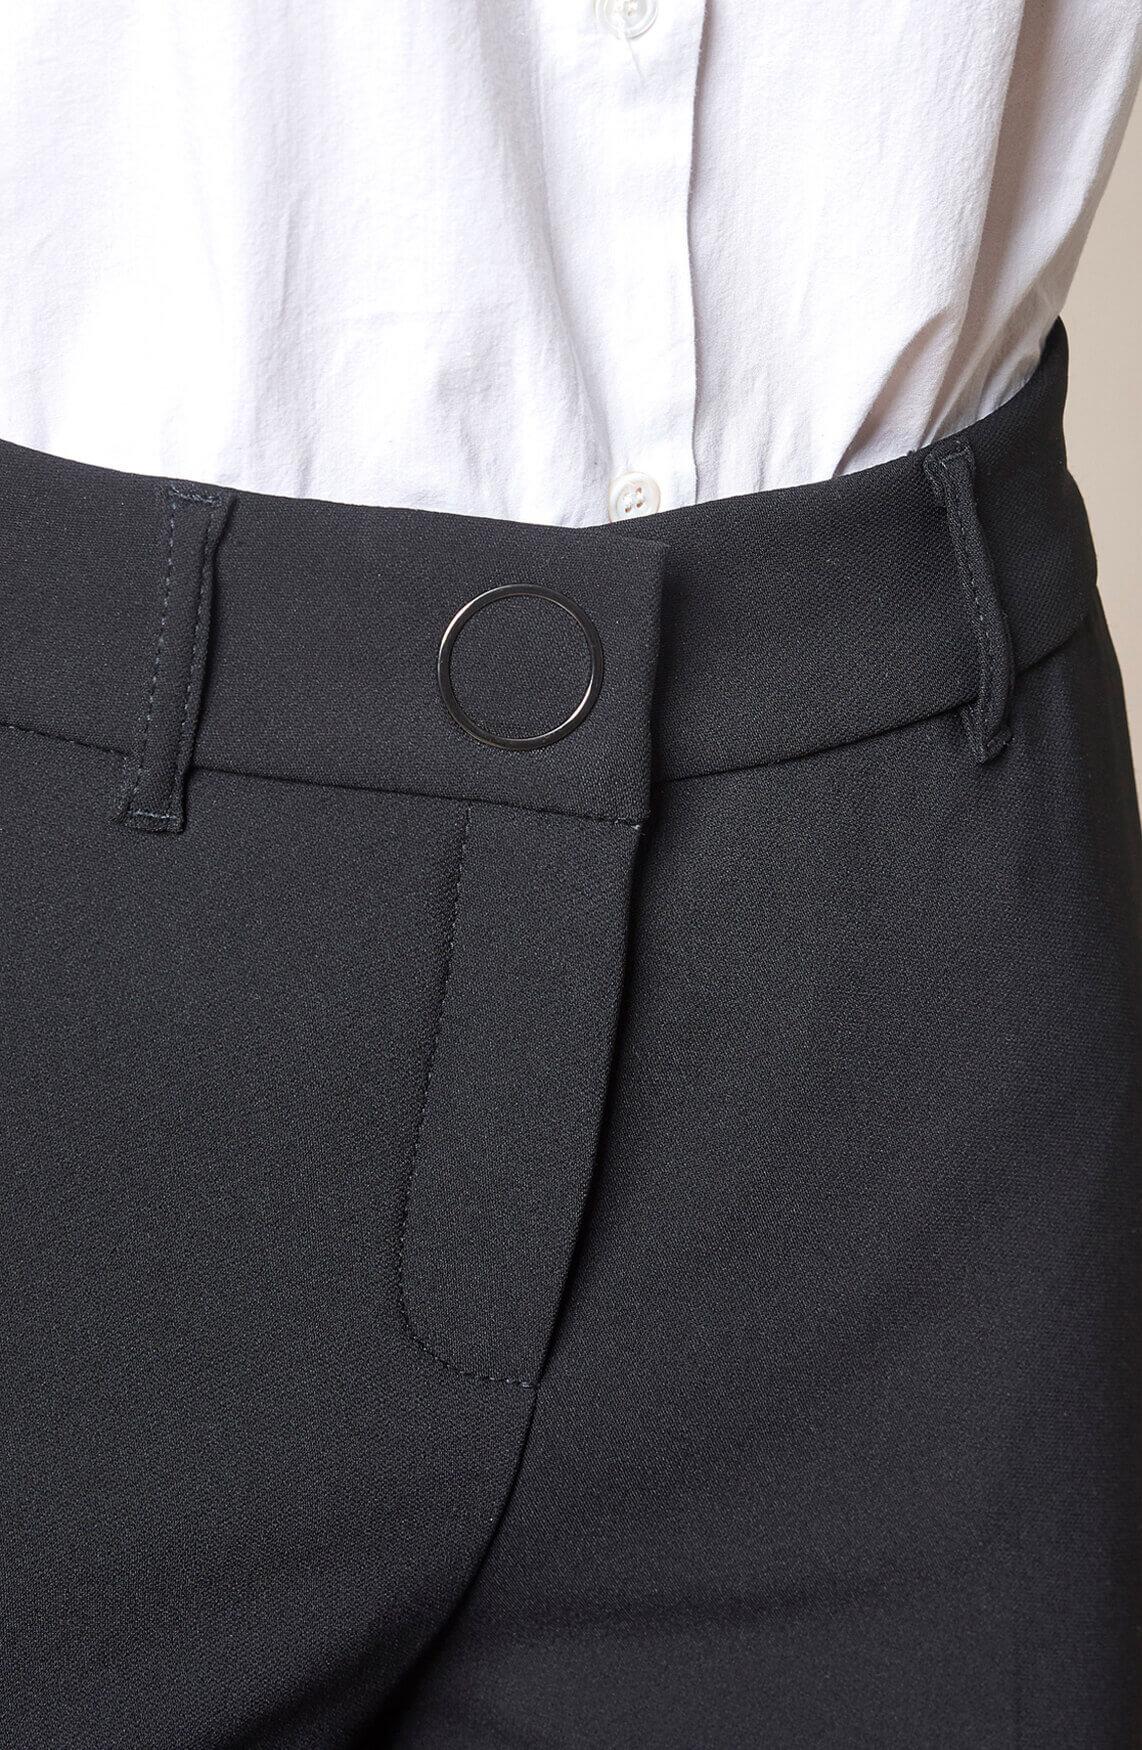 Rosner Dames May wijde pantalon zwart